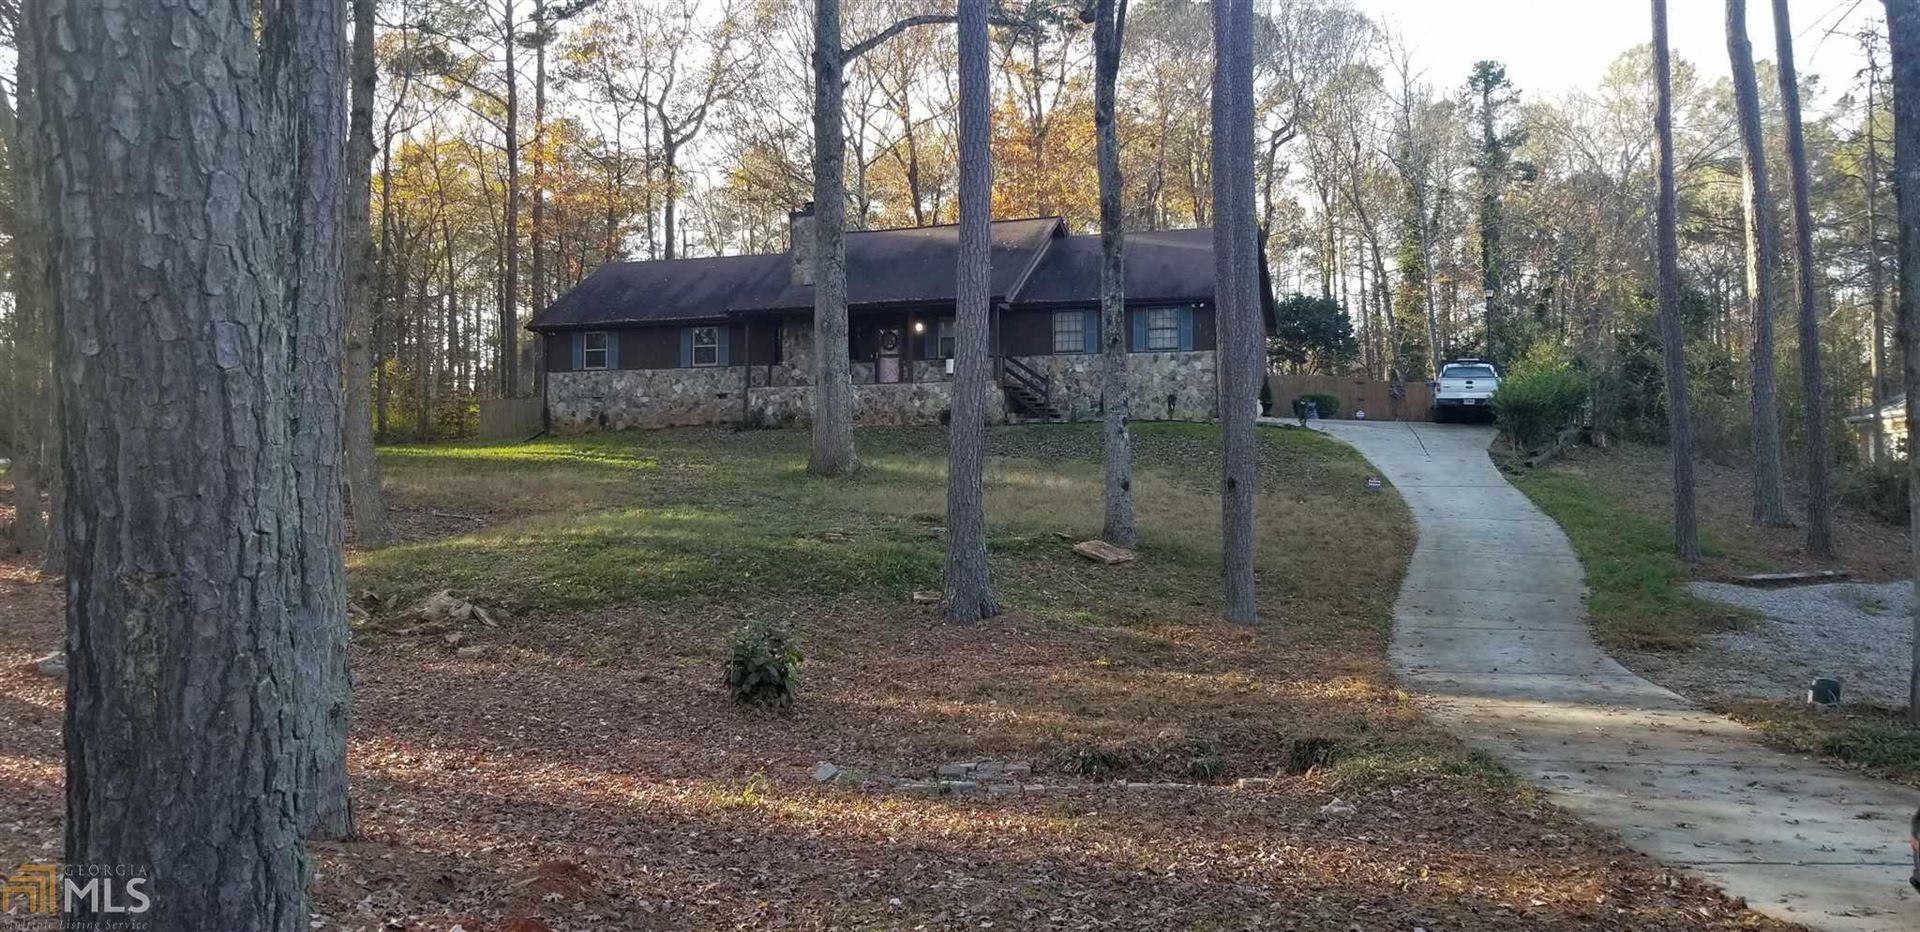 100 Deer Forest Trl, Fayetteville, GA 30214 - #: 8902502